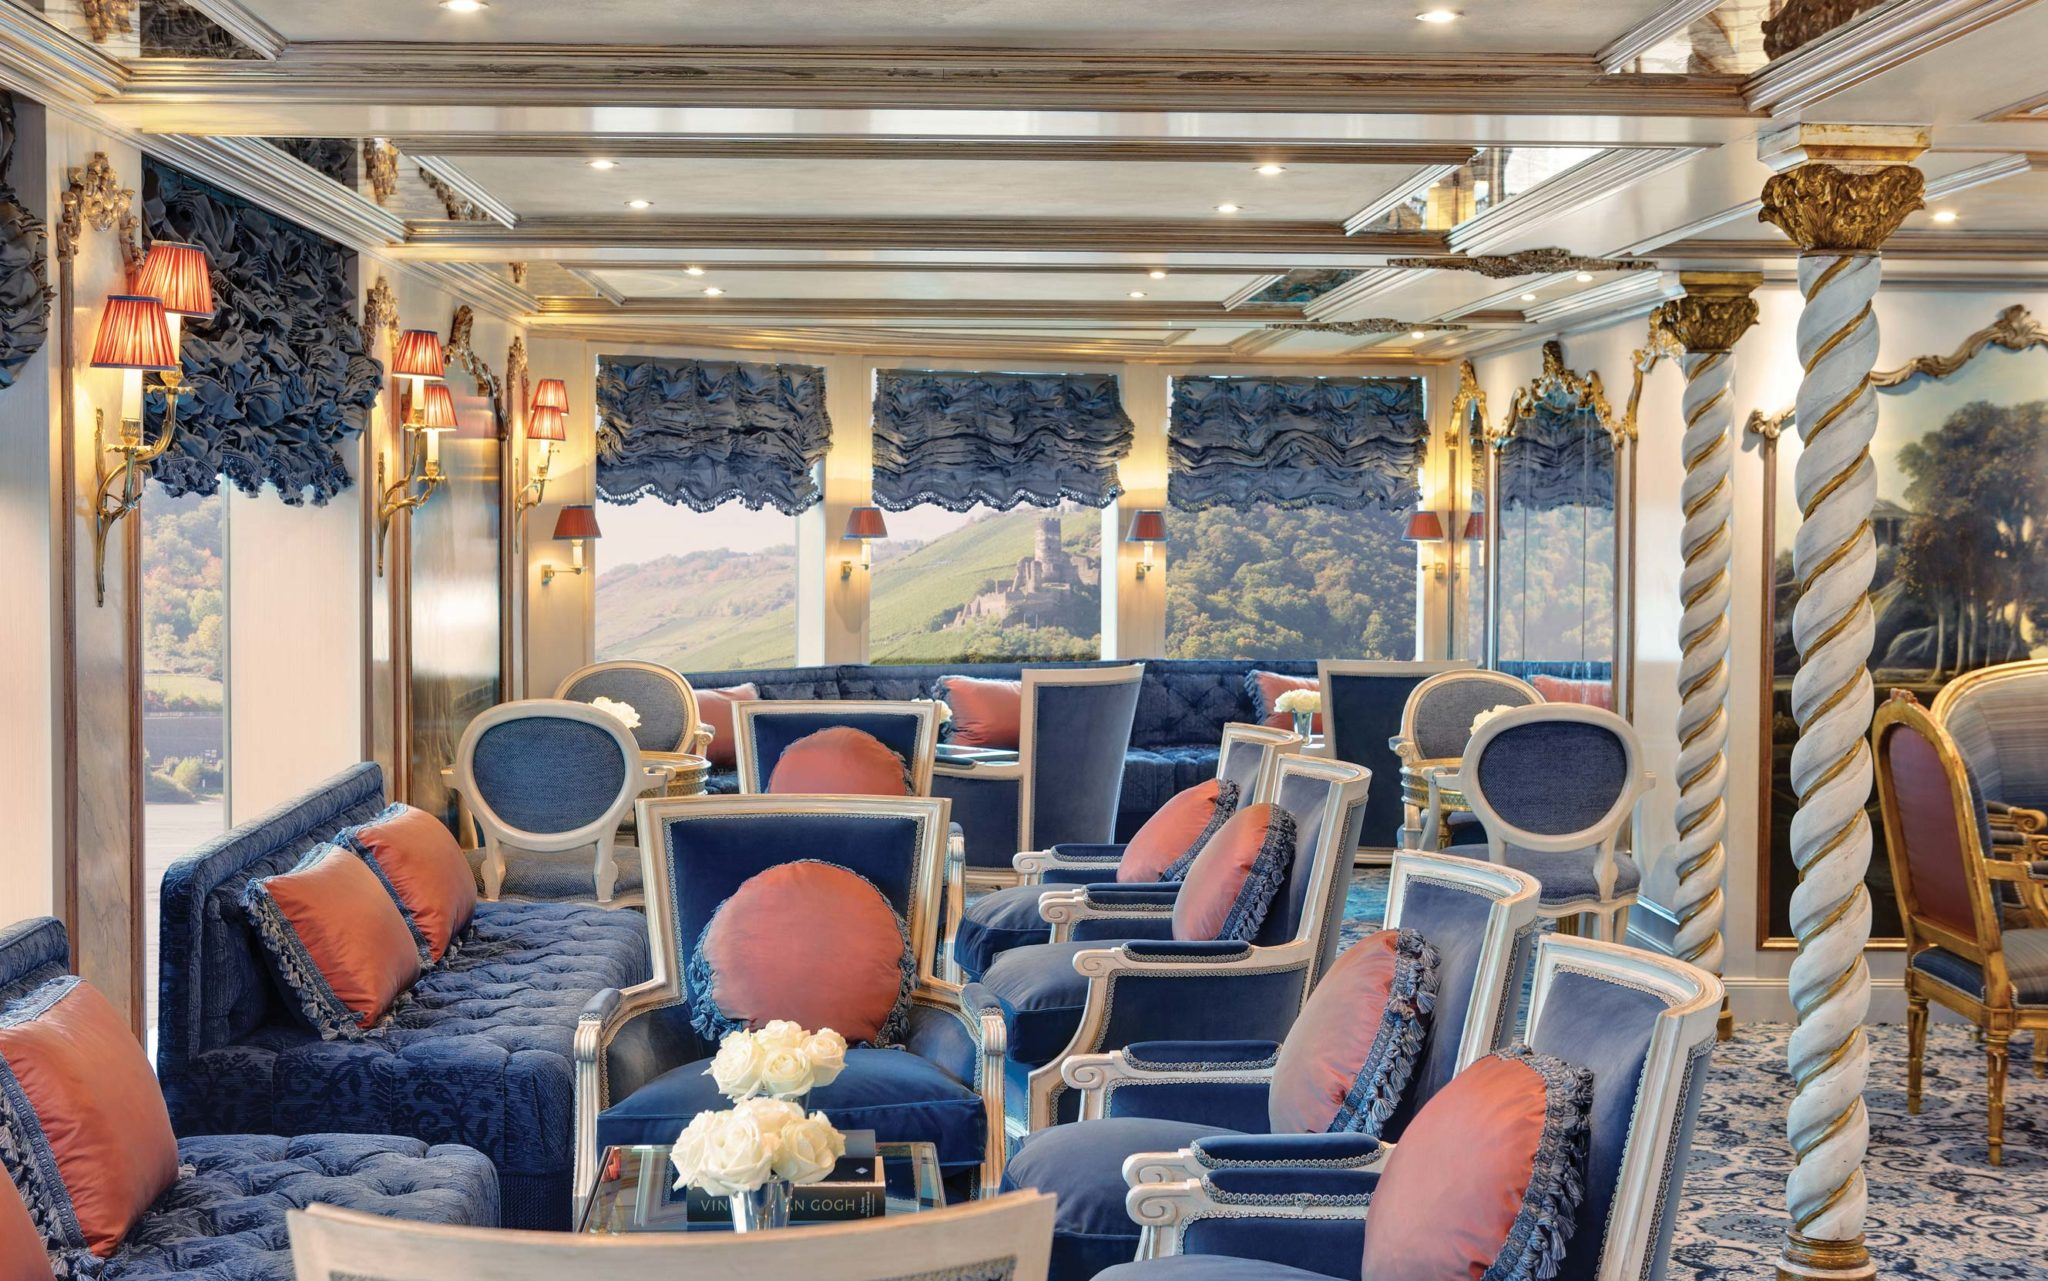 uniworld-maria-theresa-Lounge-07600-ship-slideshow